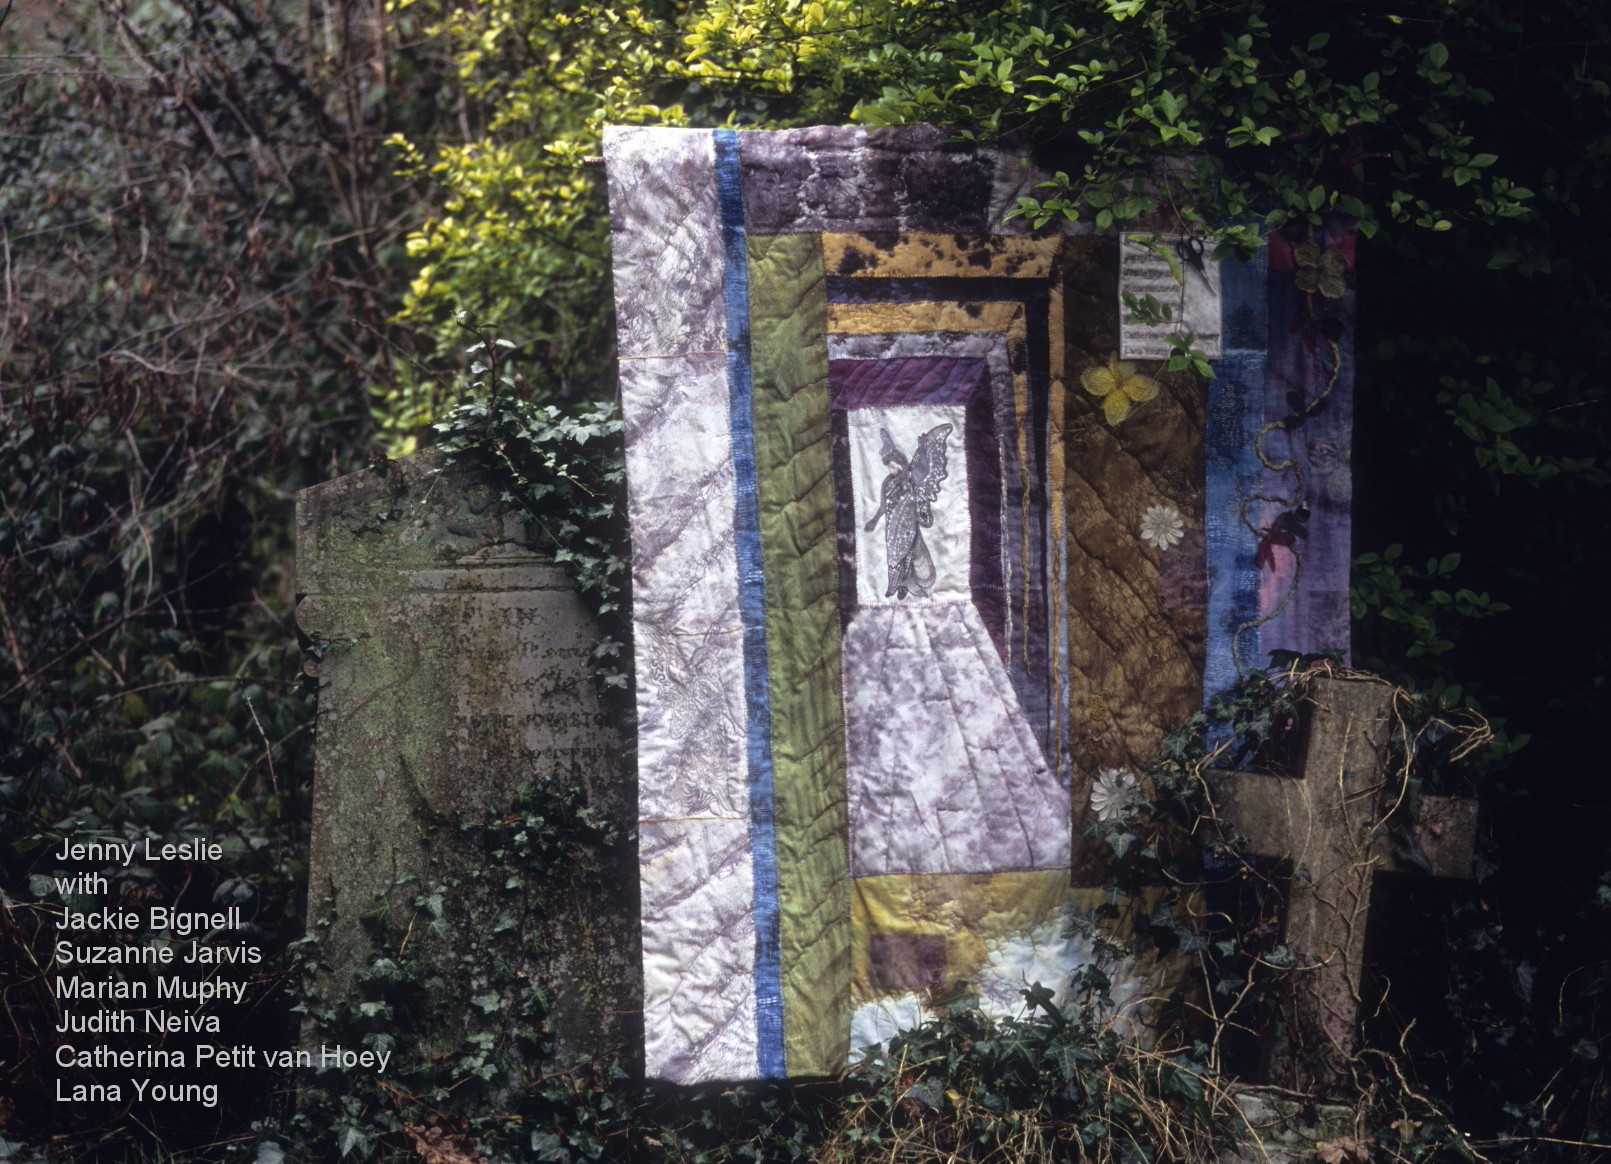 Final textile art piece